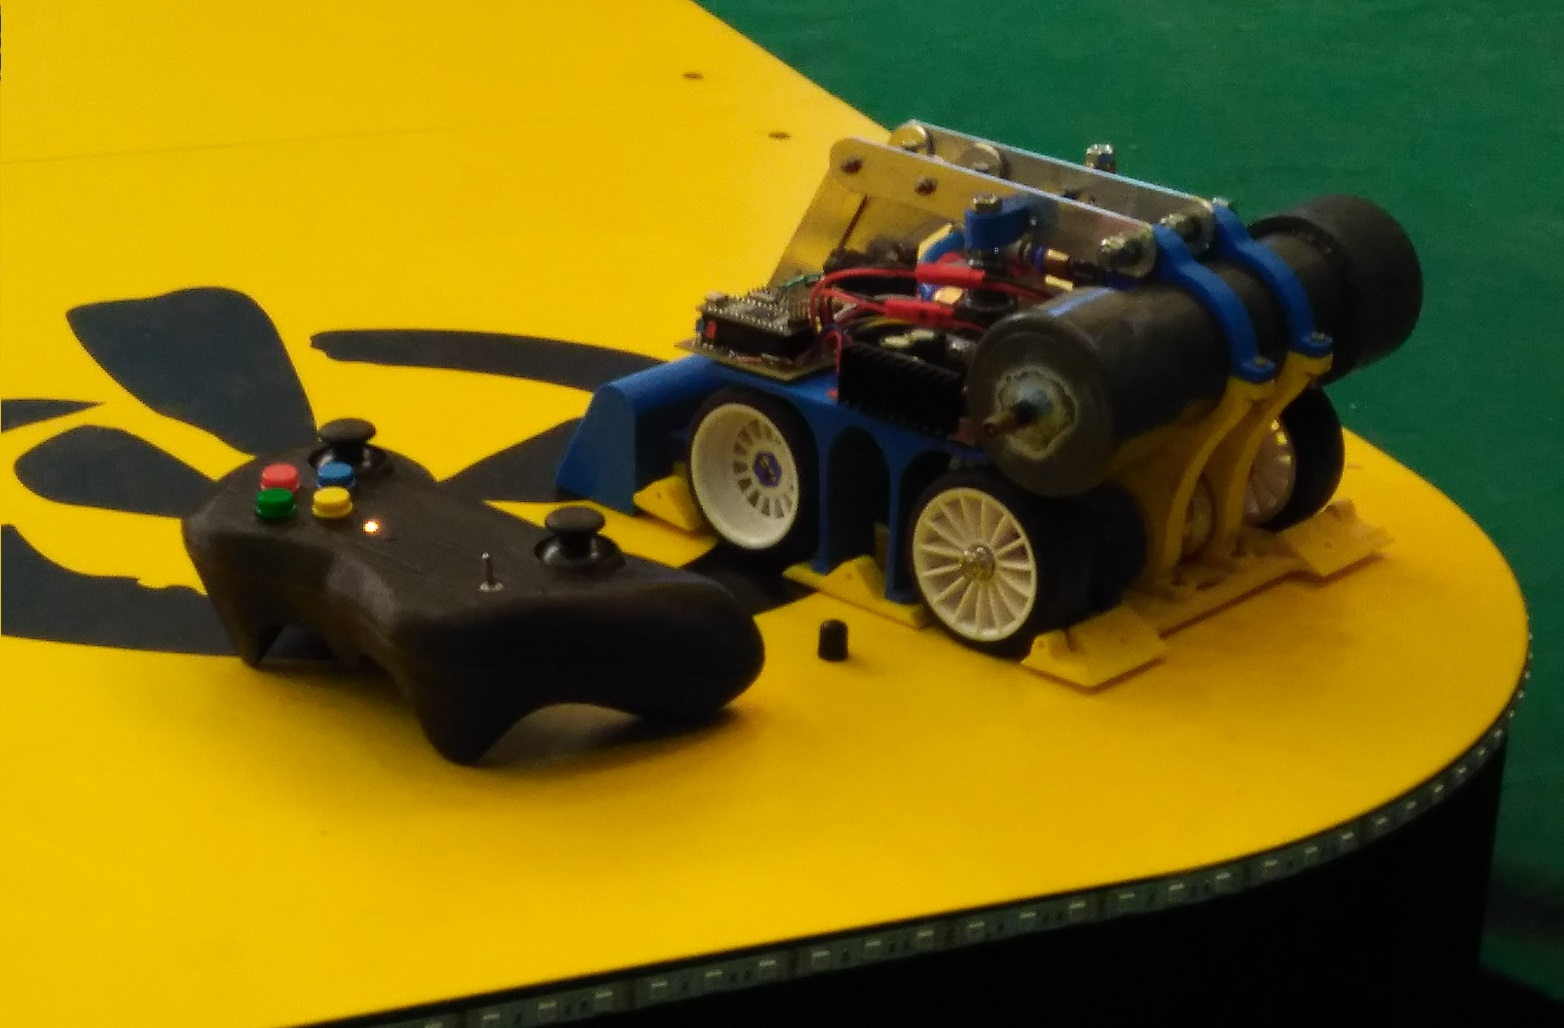 Torneo de robótica